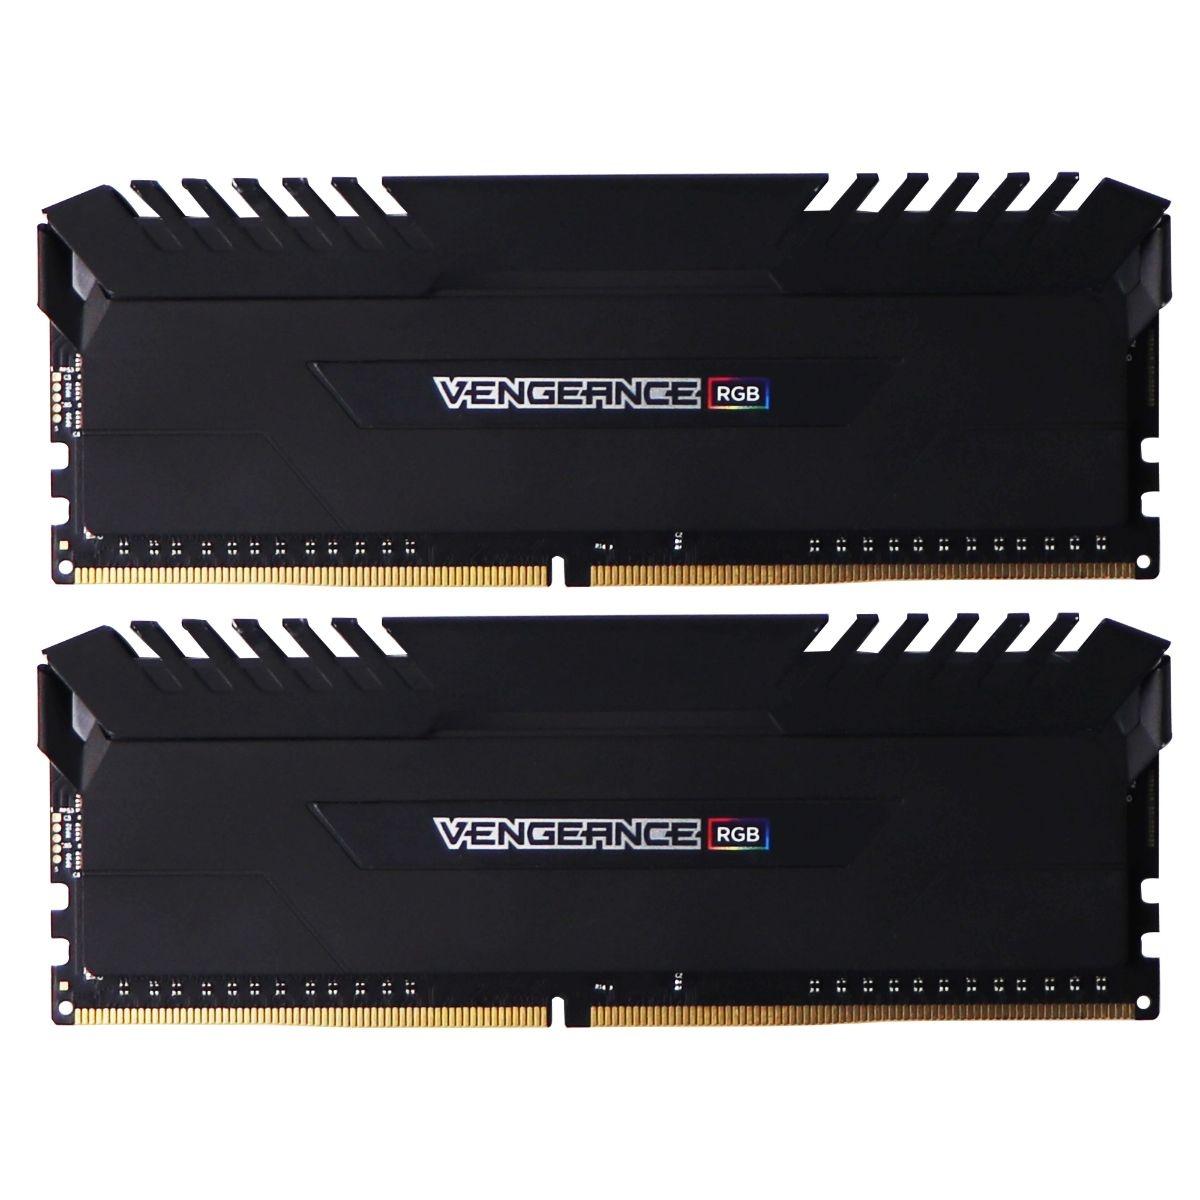 Corsair Vengeance RGB 16GB (2x8GB) DDR4 3466MHz C16 Desktop Memory - Black